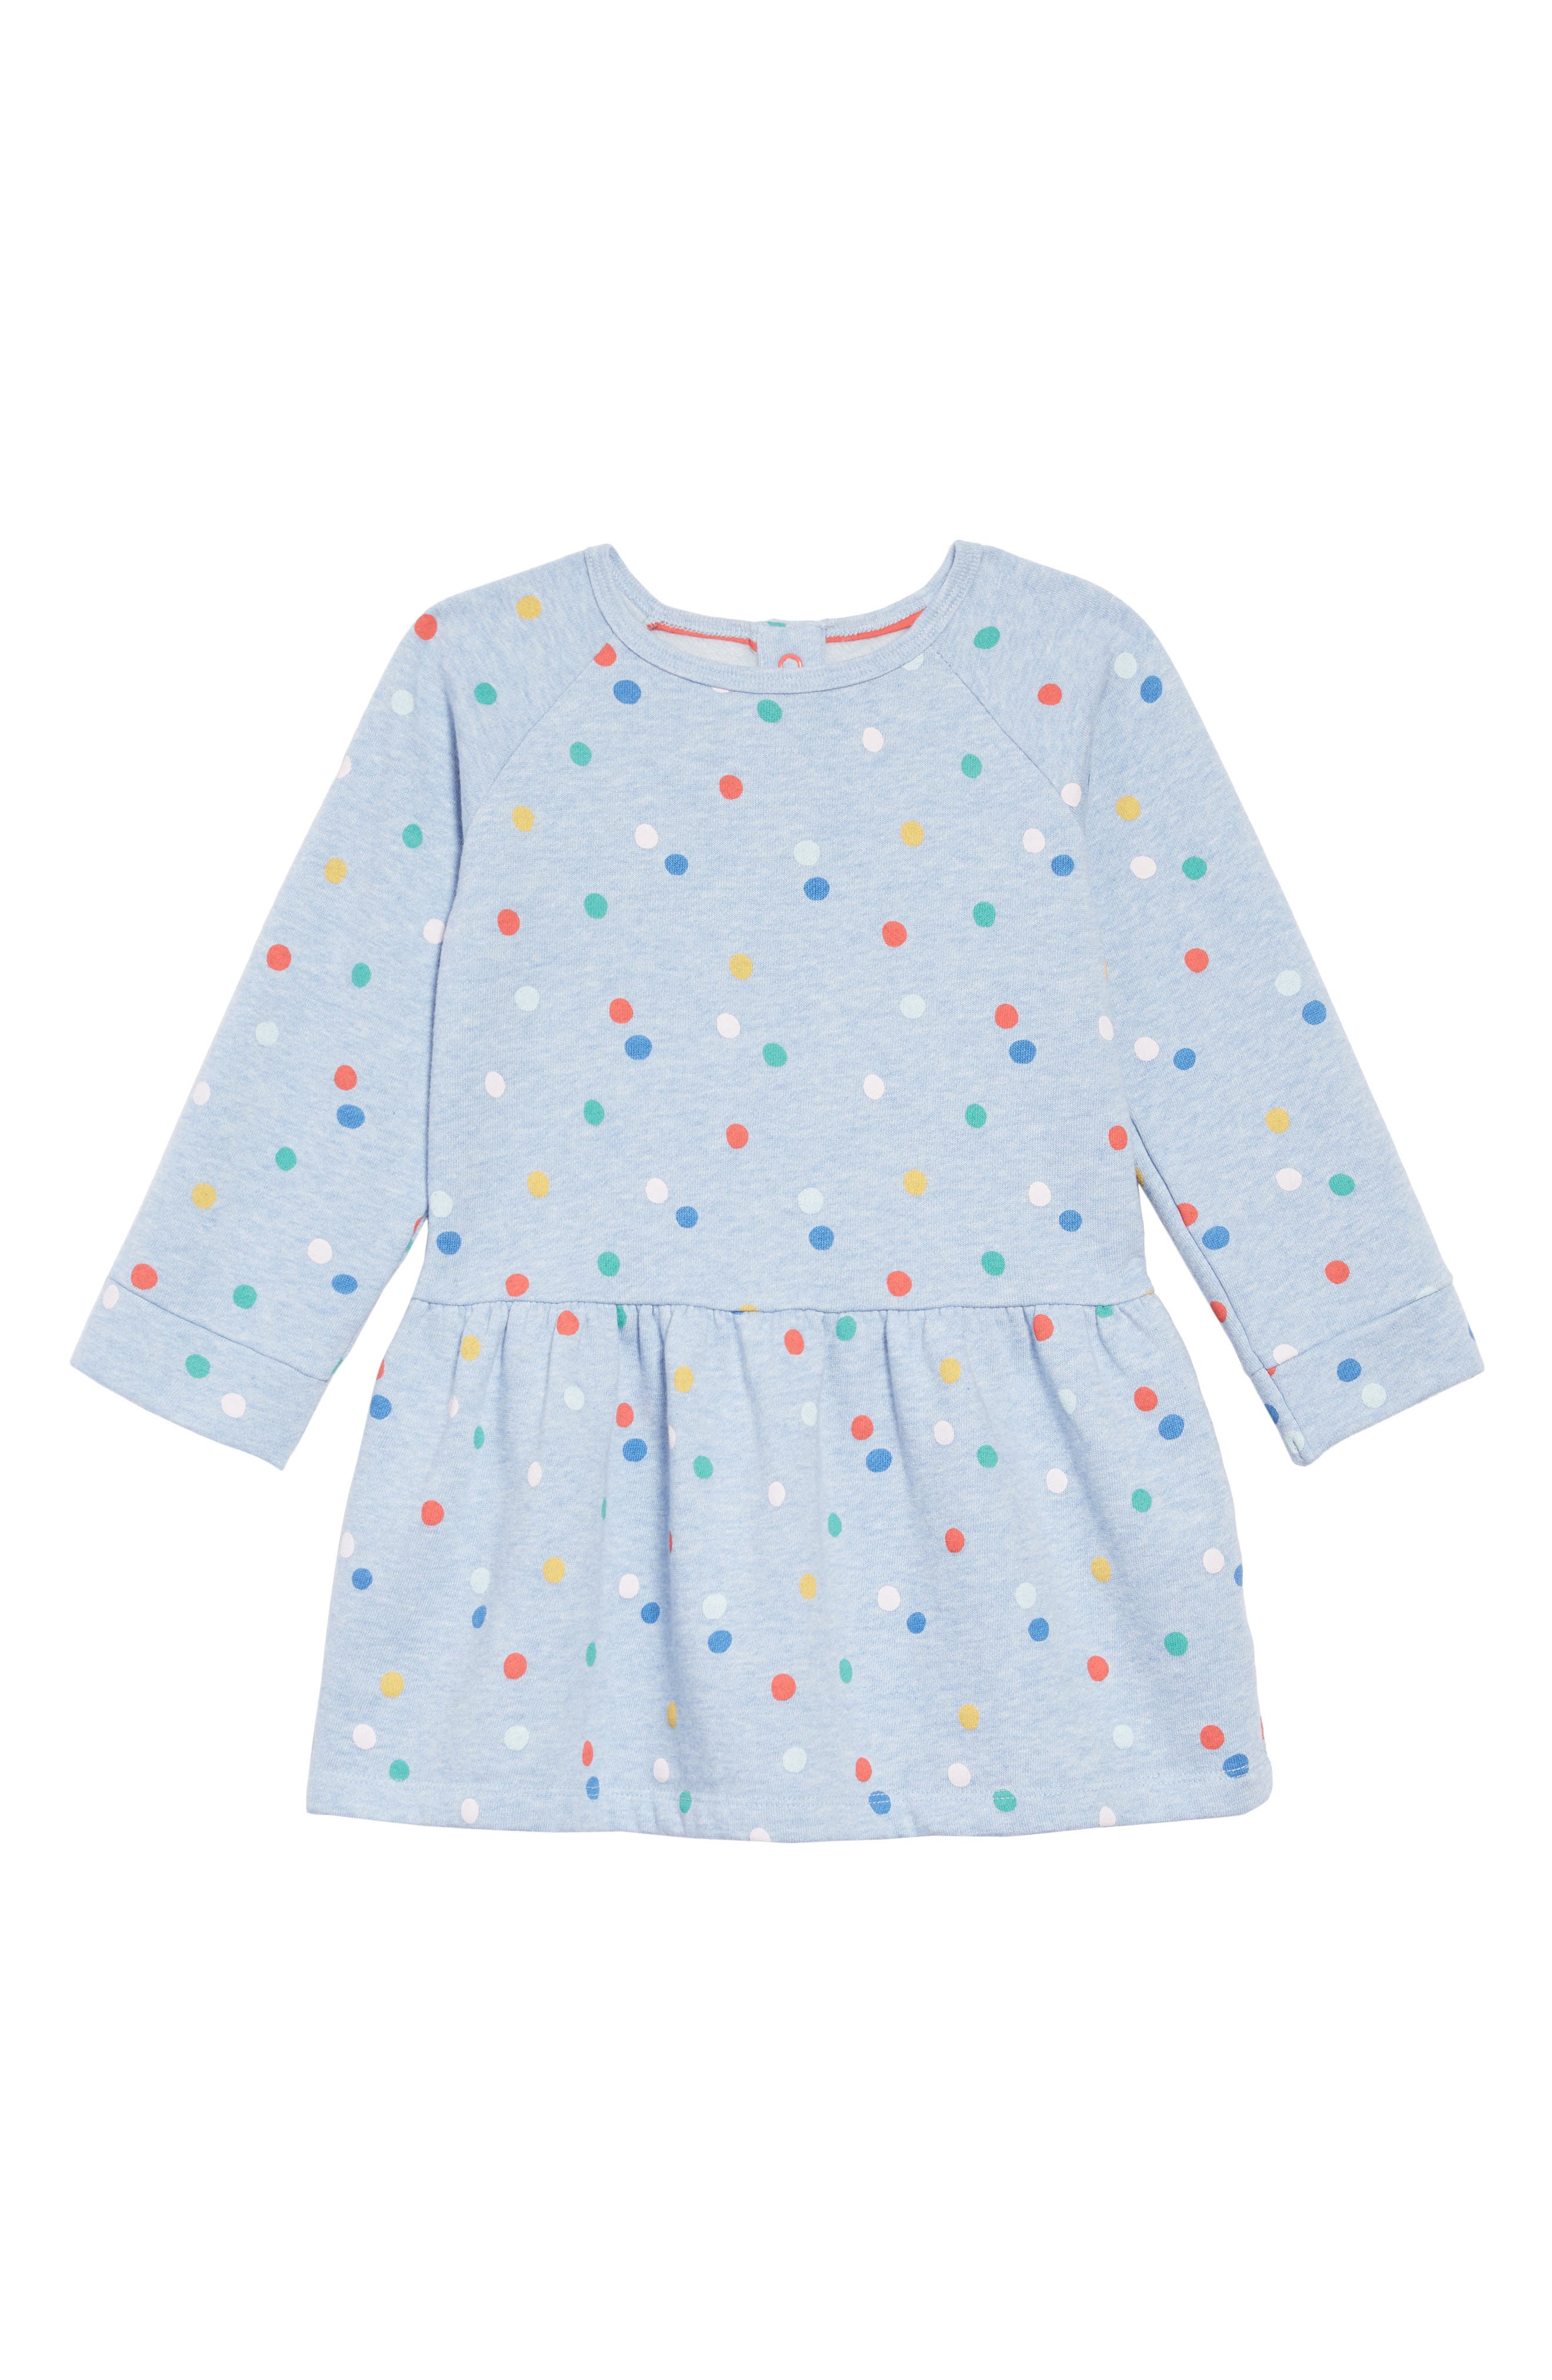 Colorful Cozy Dress,                             Main thumbnail 1, color,                             MUL MULTI PAINTED SPOT